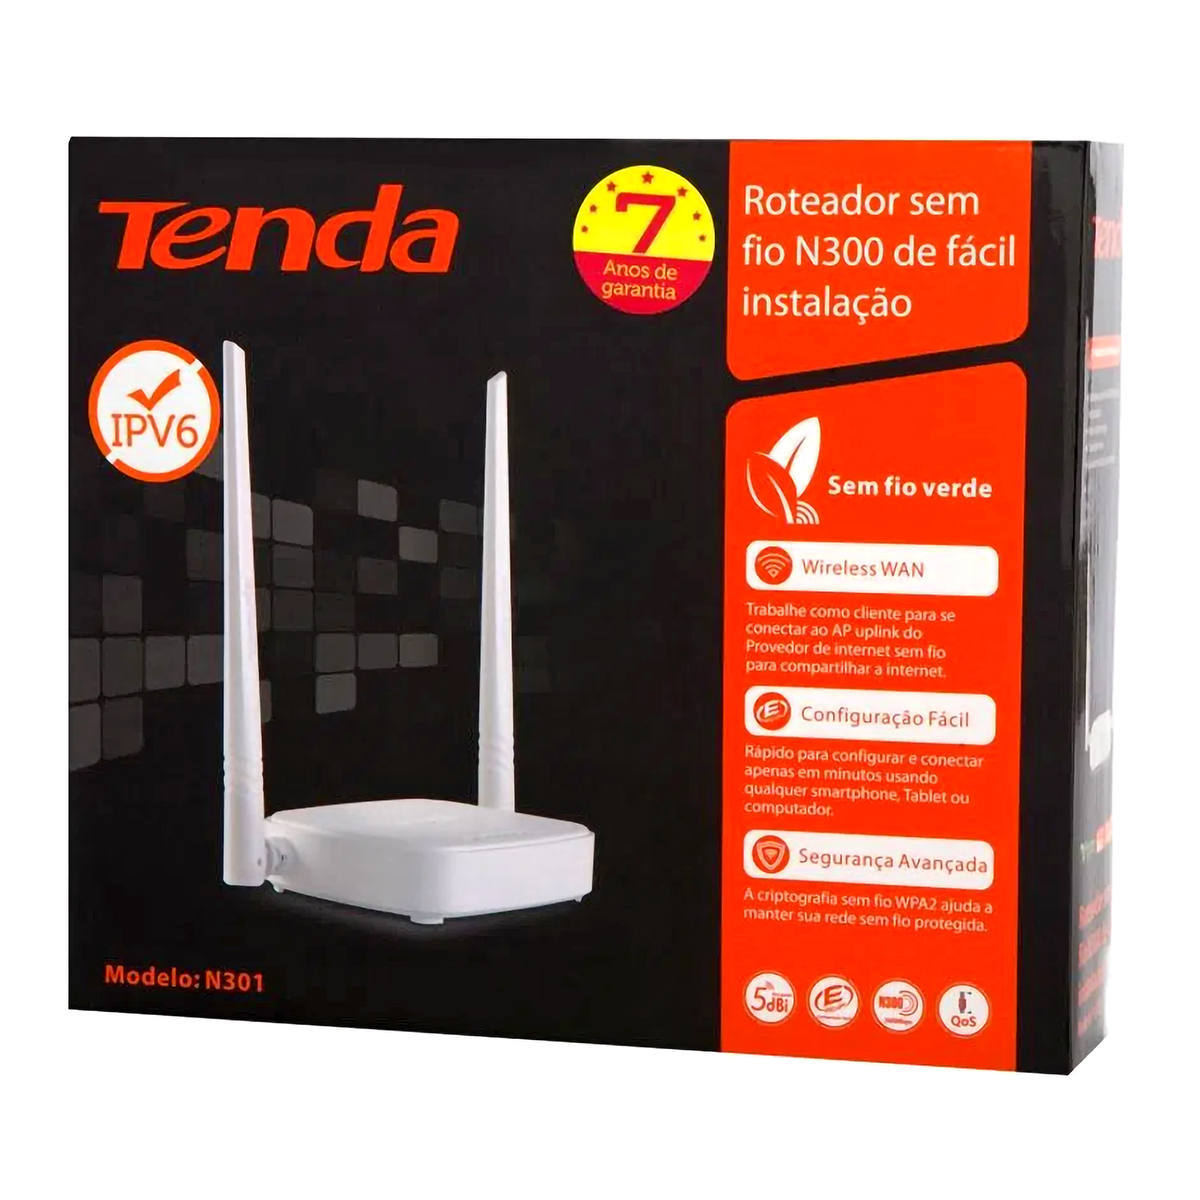 Roteador Wireless 300Mbps 2 Antenas Externas 3 Portas LAN 802.11N Sem Fio Tenda N301